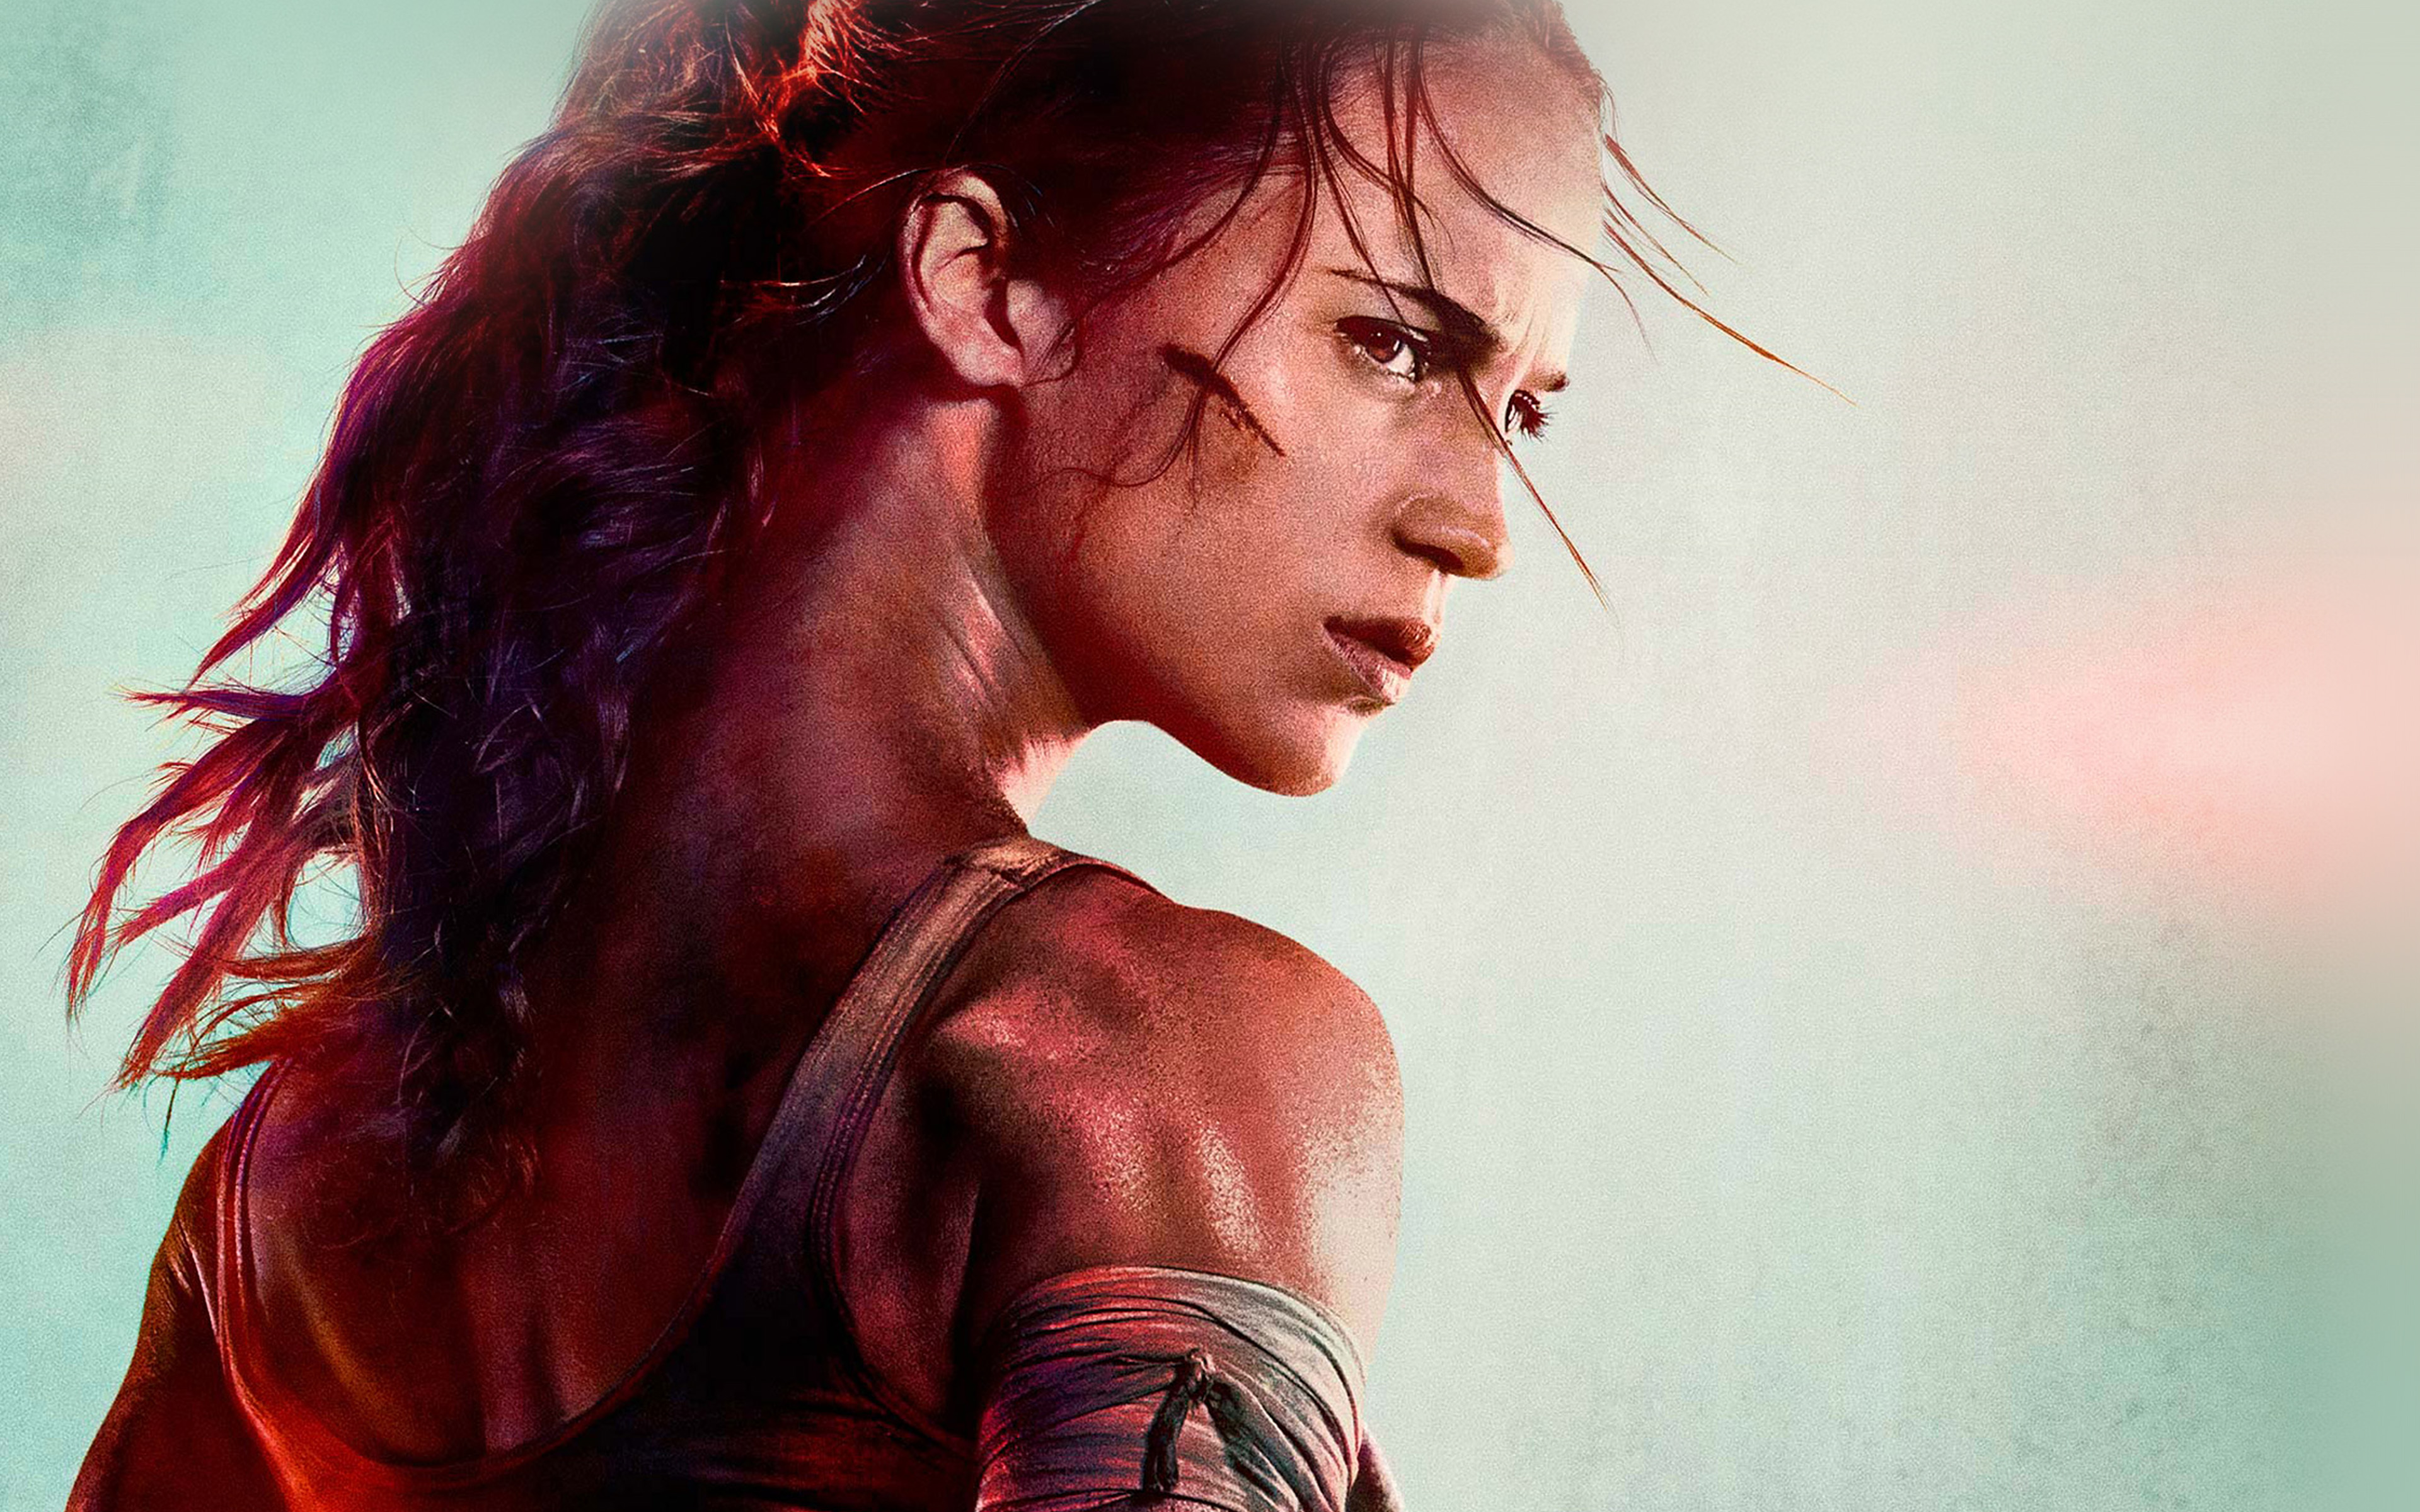 Be46 Lara Croft Tomb Raider Film Art Illustration Wallpaper